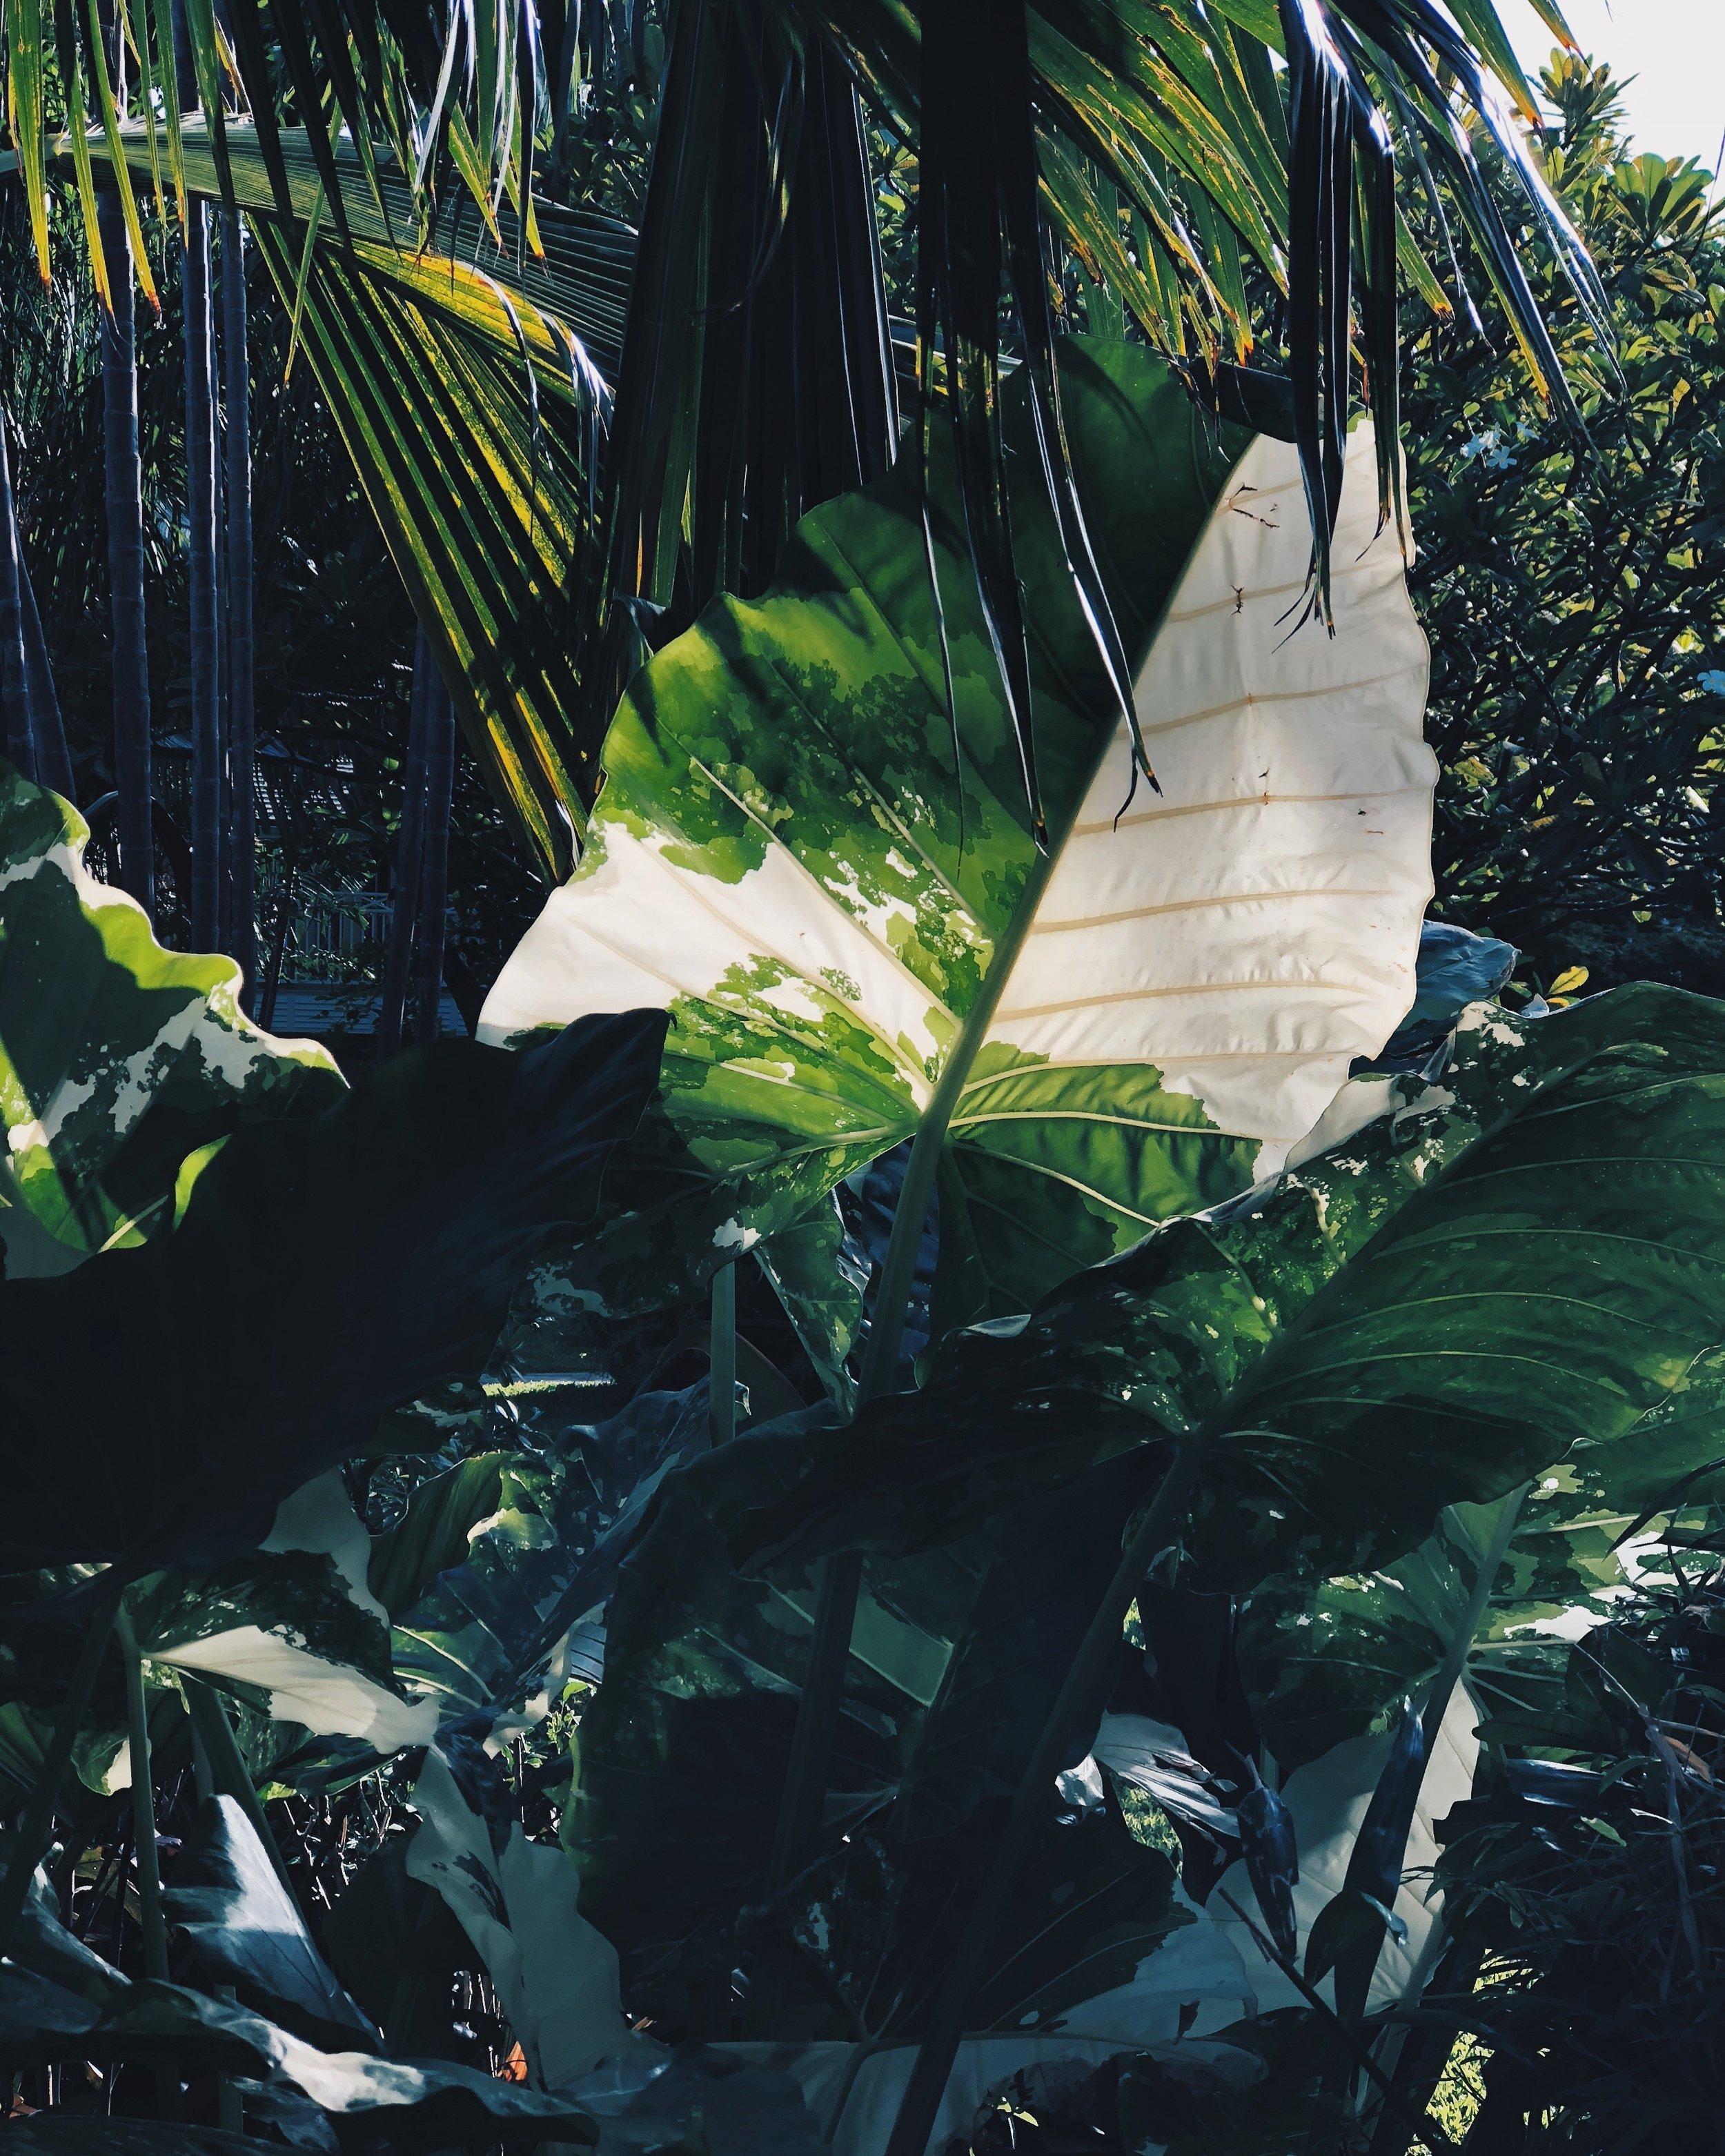 Barbados-via-cobblers-cove-kiel-bonhomme-3